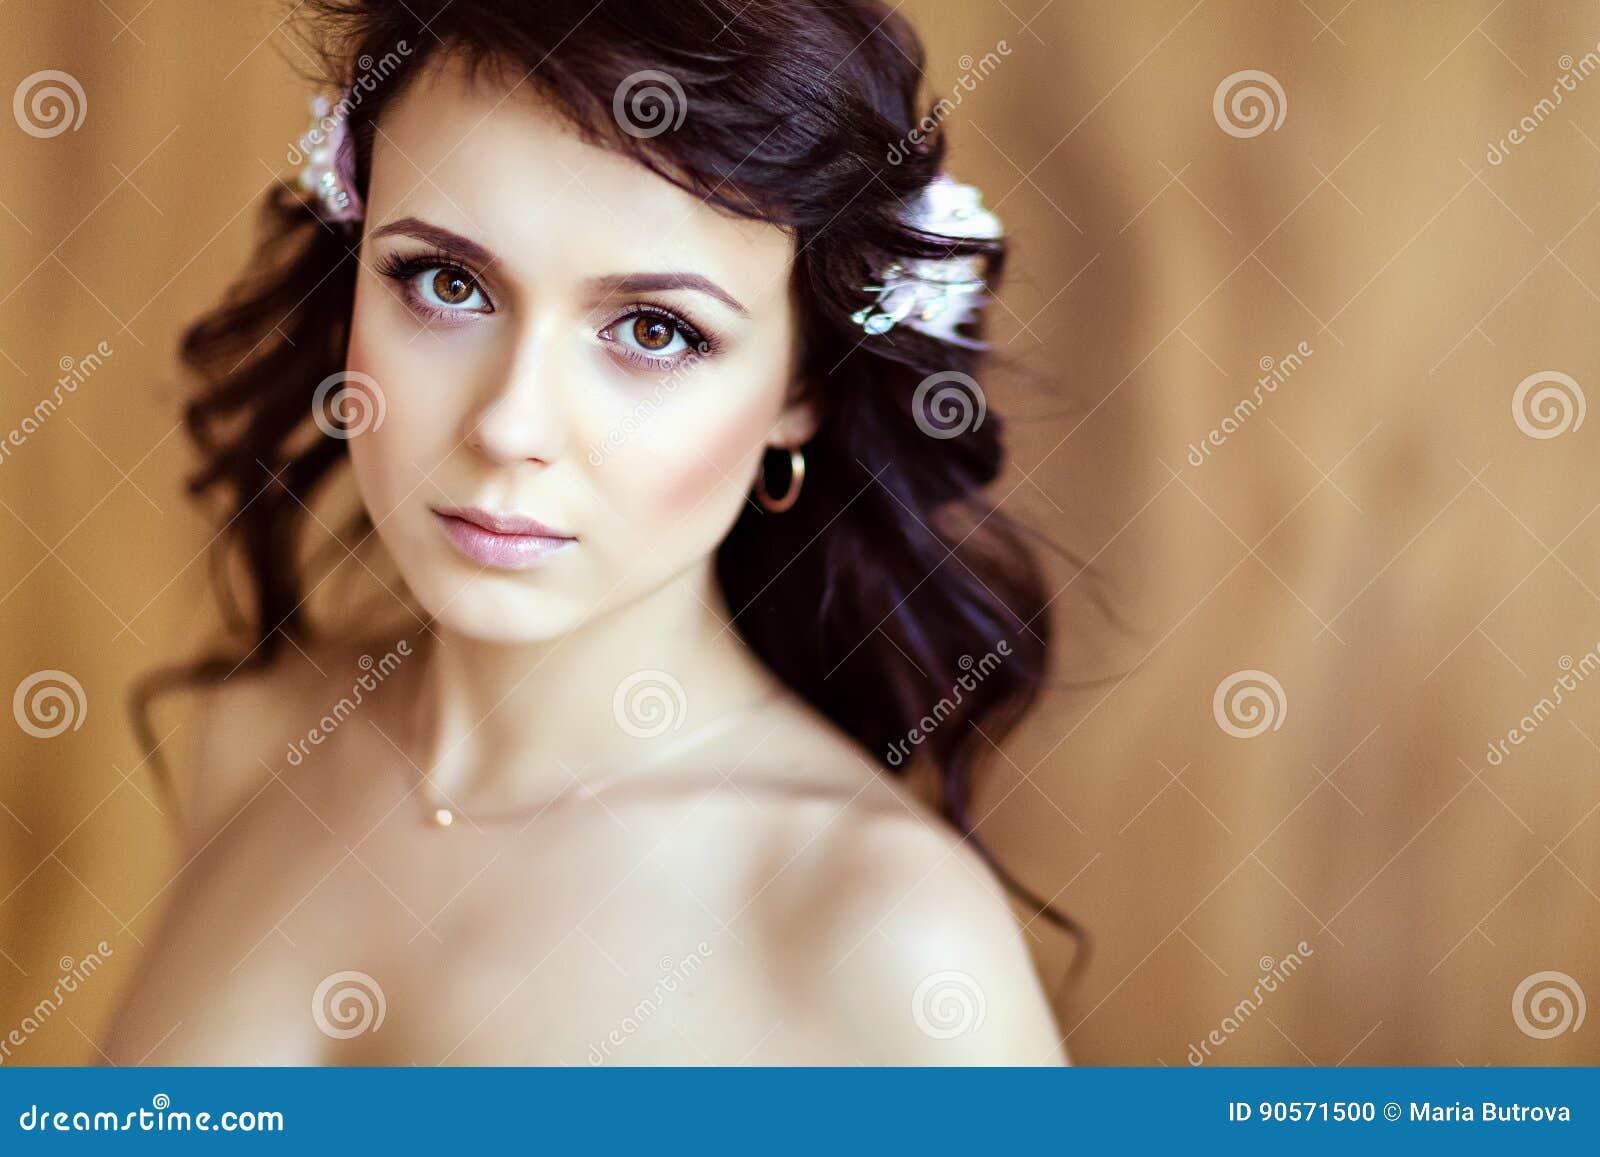 portrait of a very cute sensual beautiful girls brunette with wa